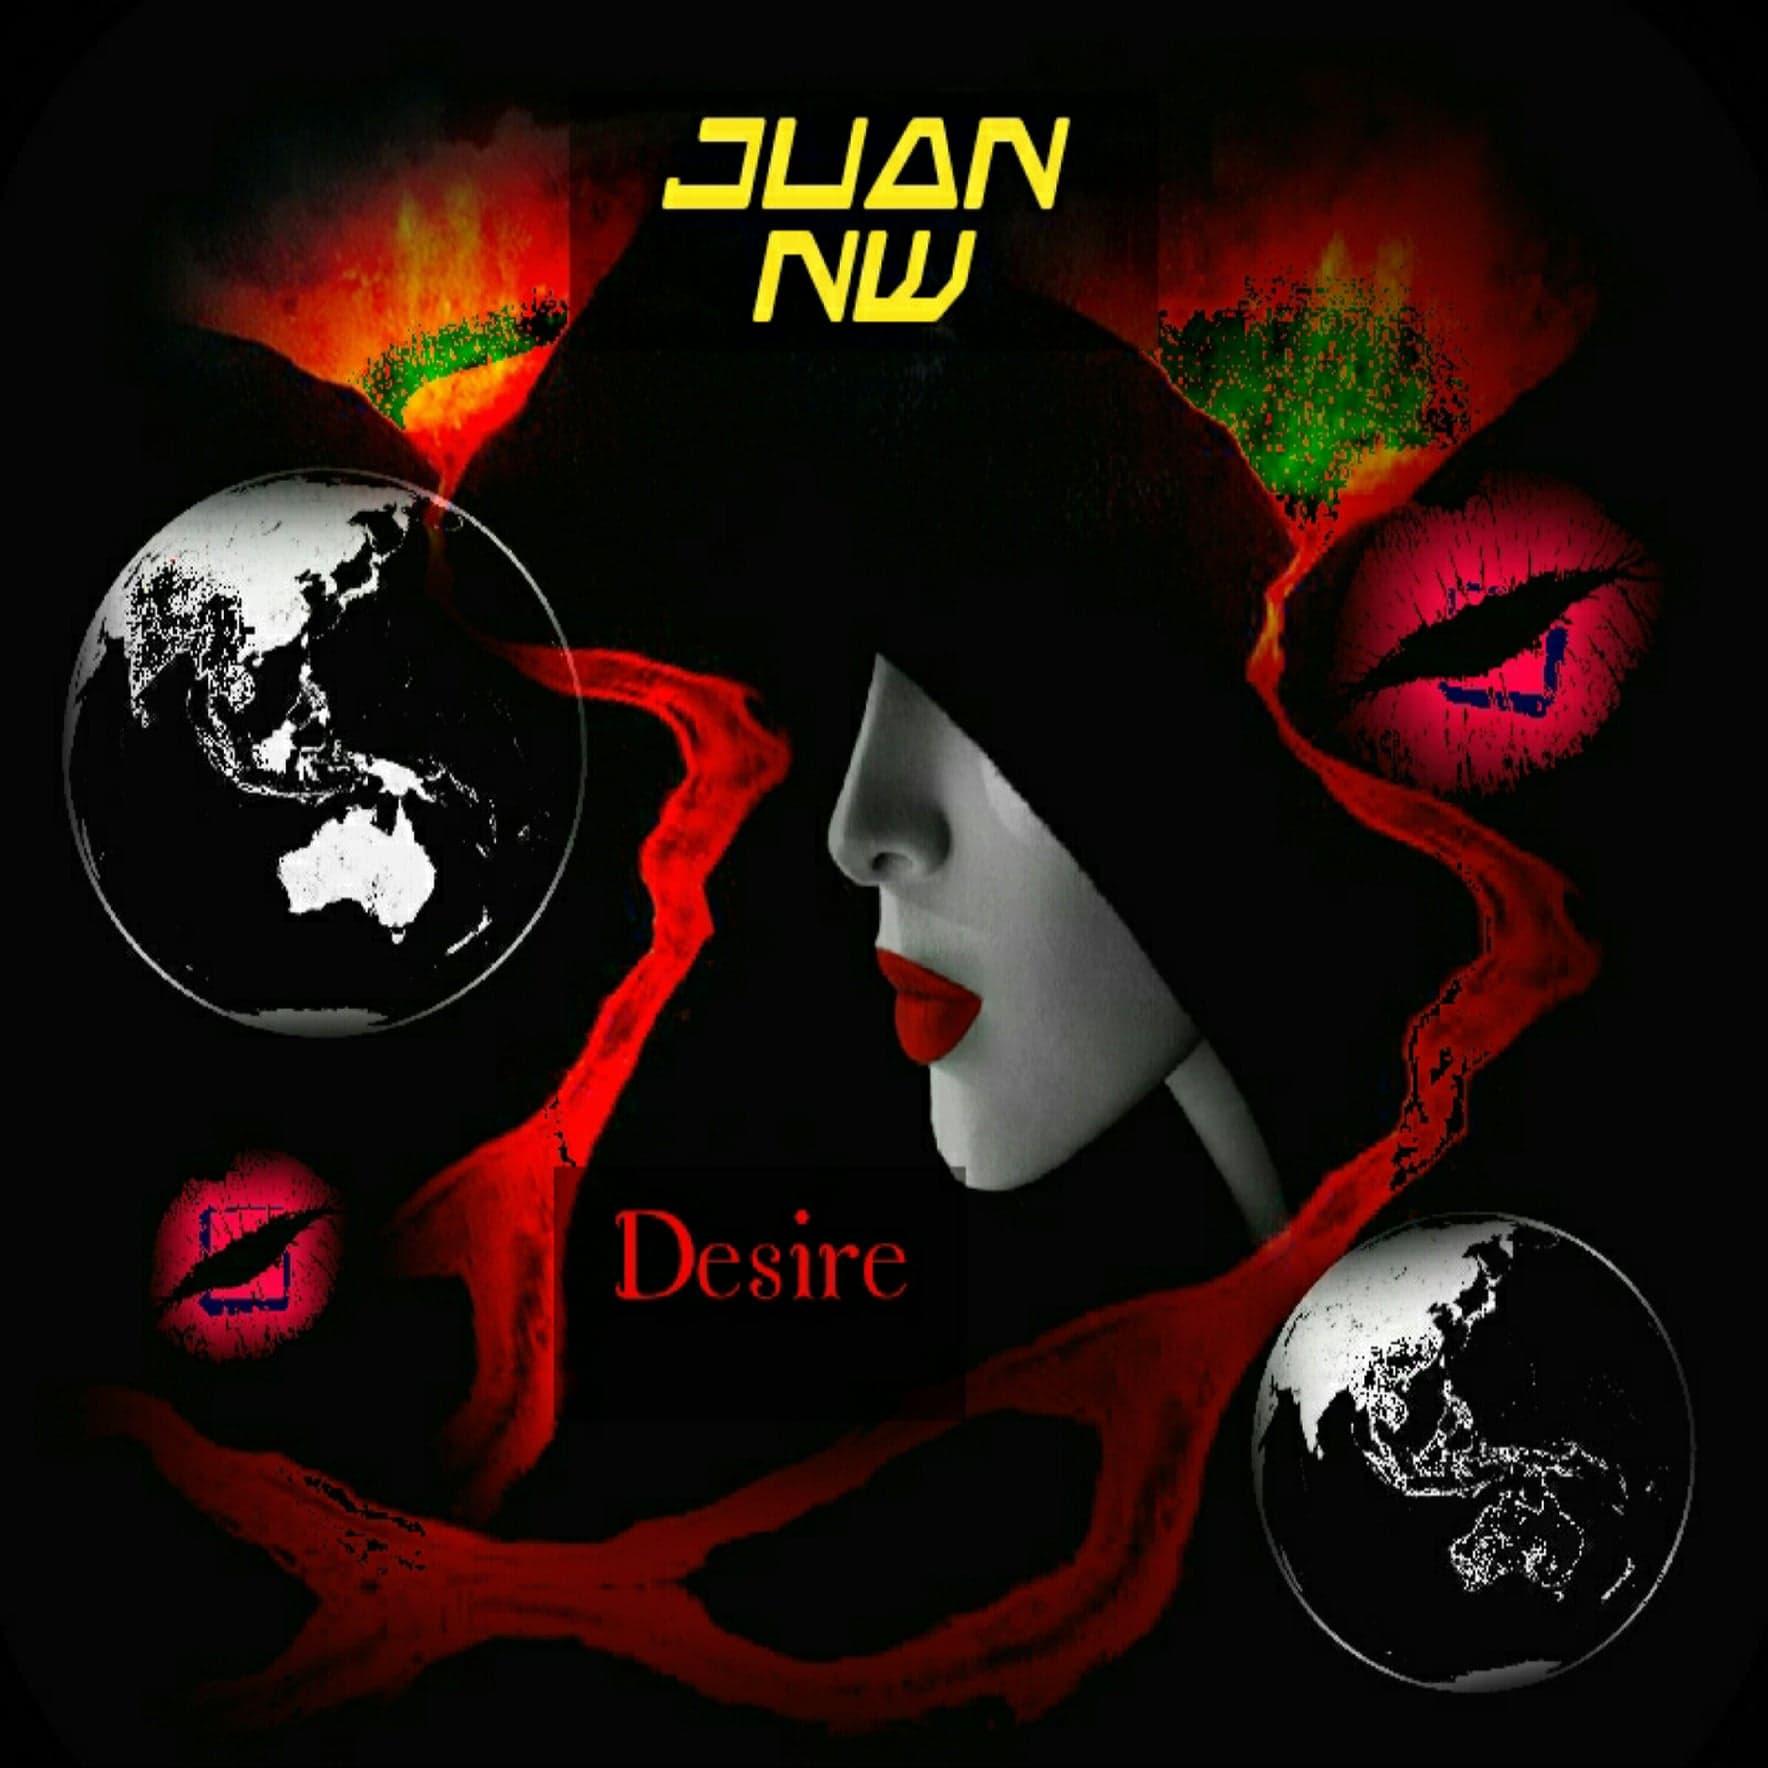 Desire, Juan NW